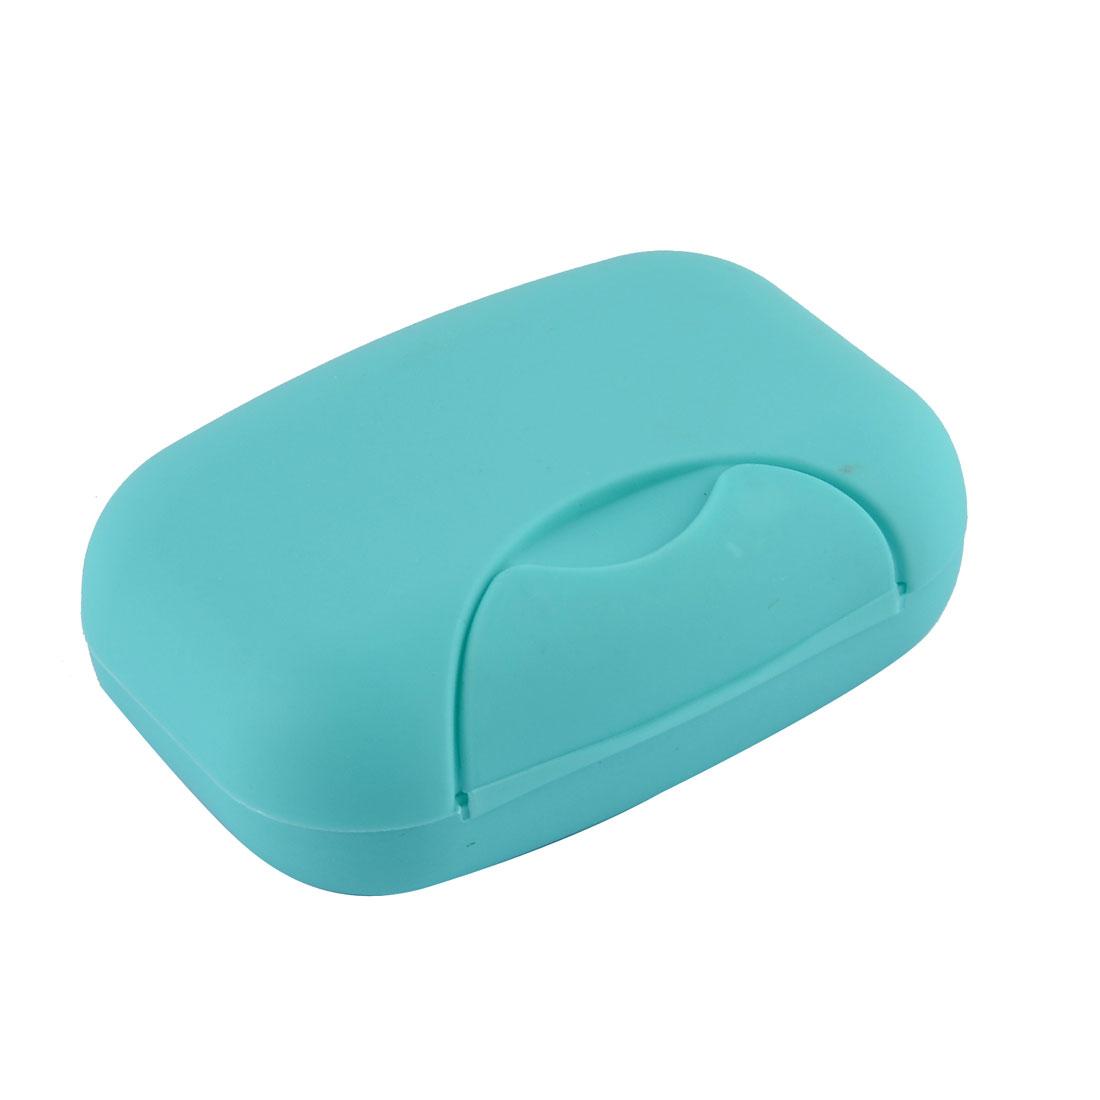 Family Bathroom Plastic Rectangle Shape Soap Holder Box Case Container Blue